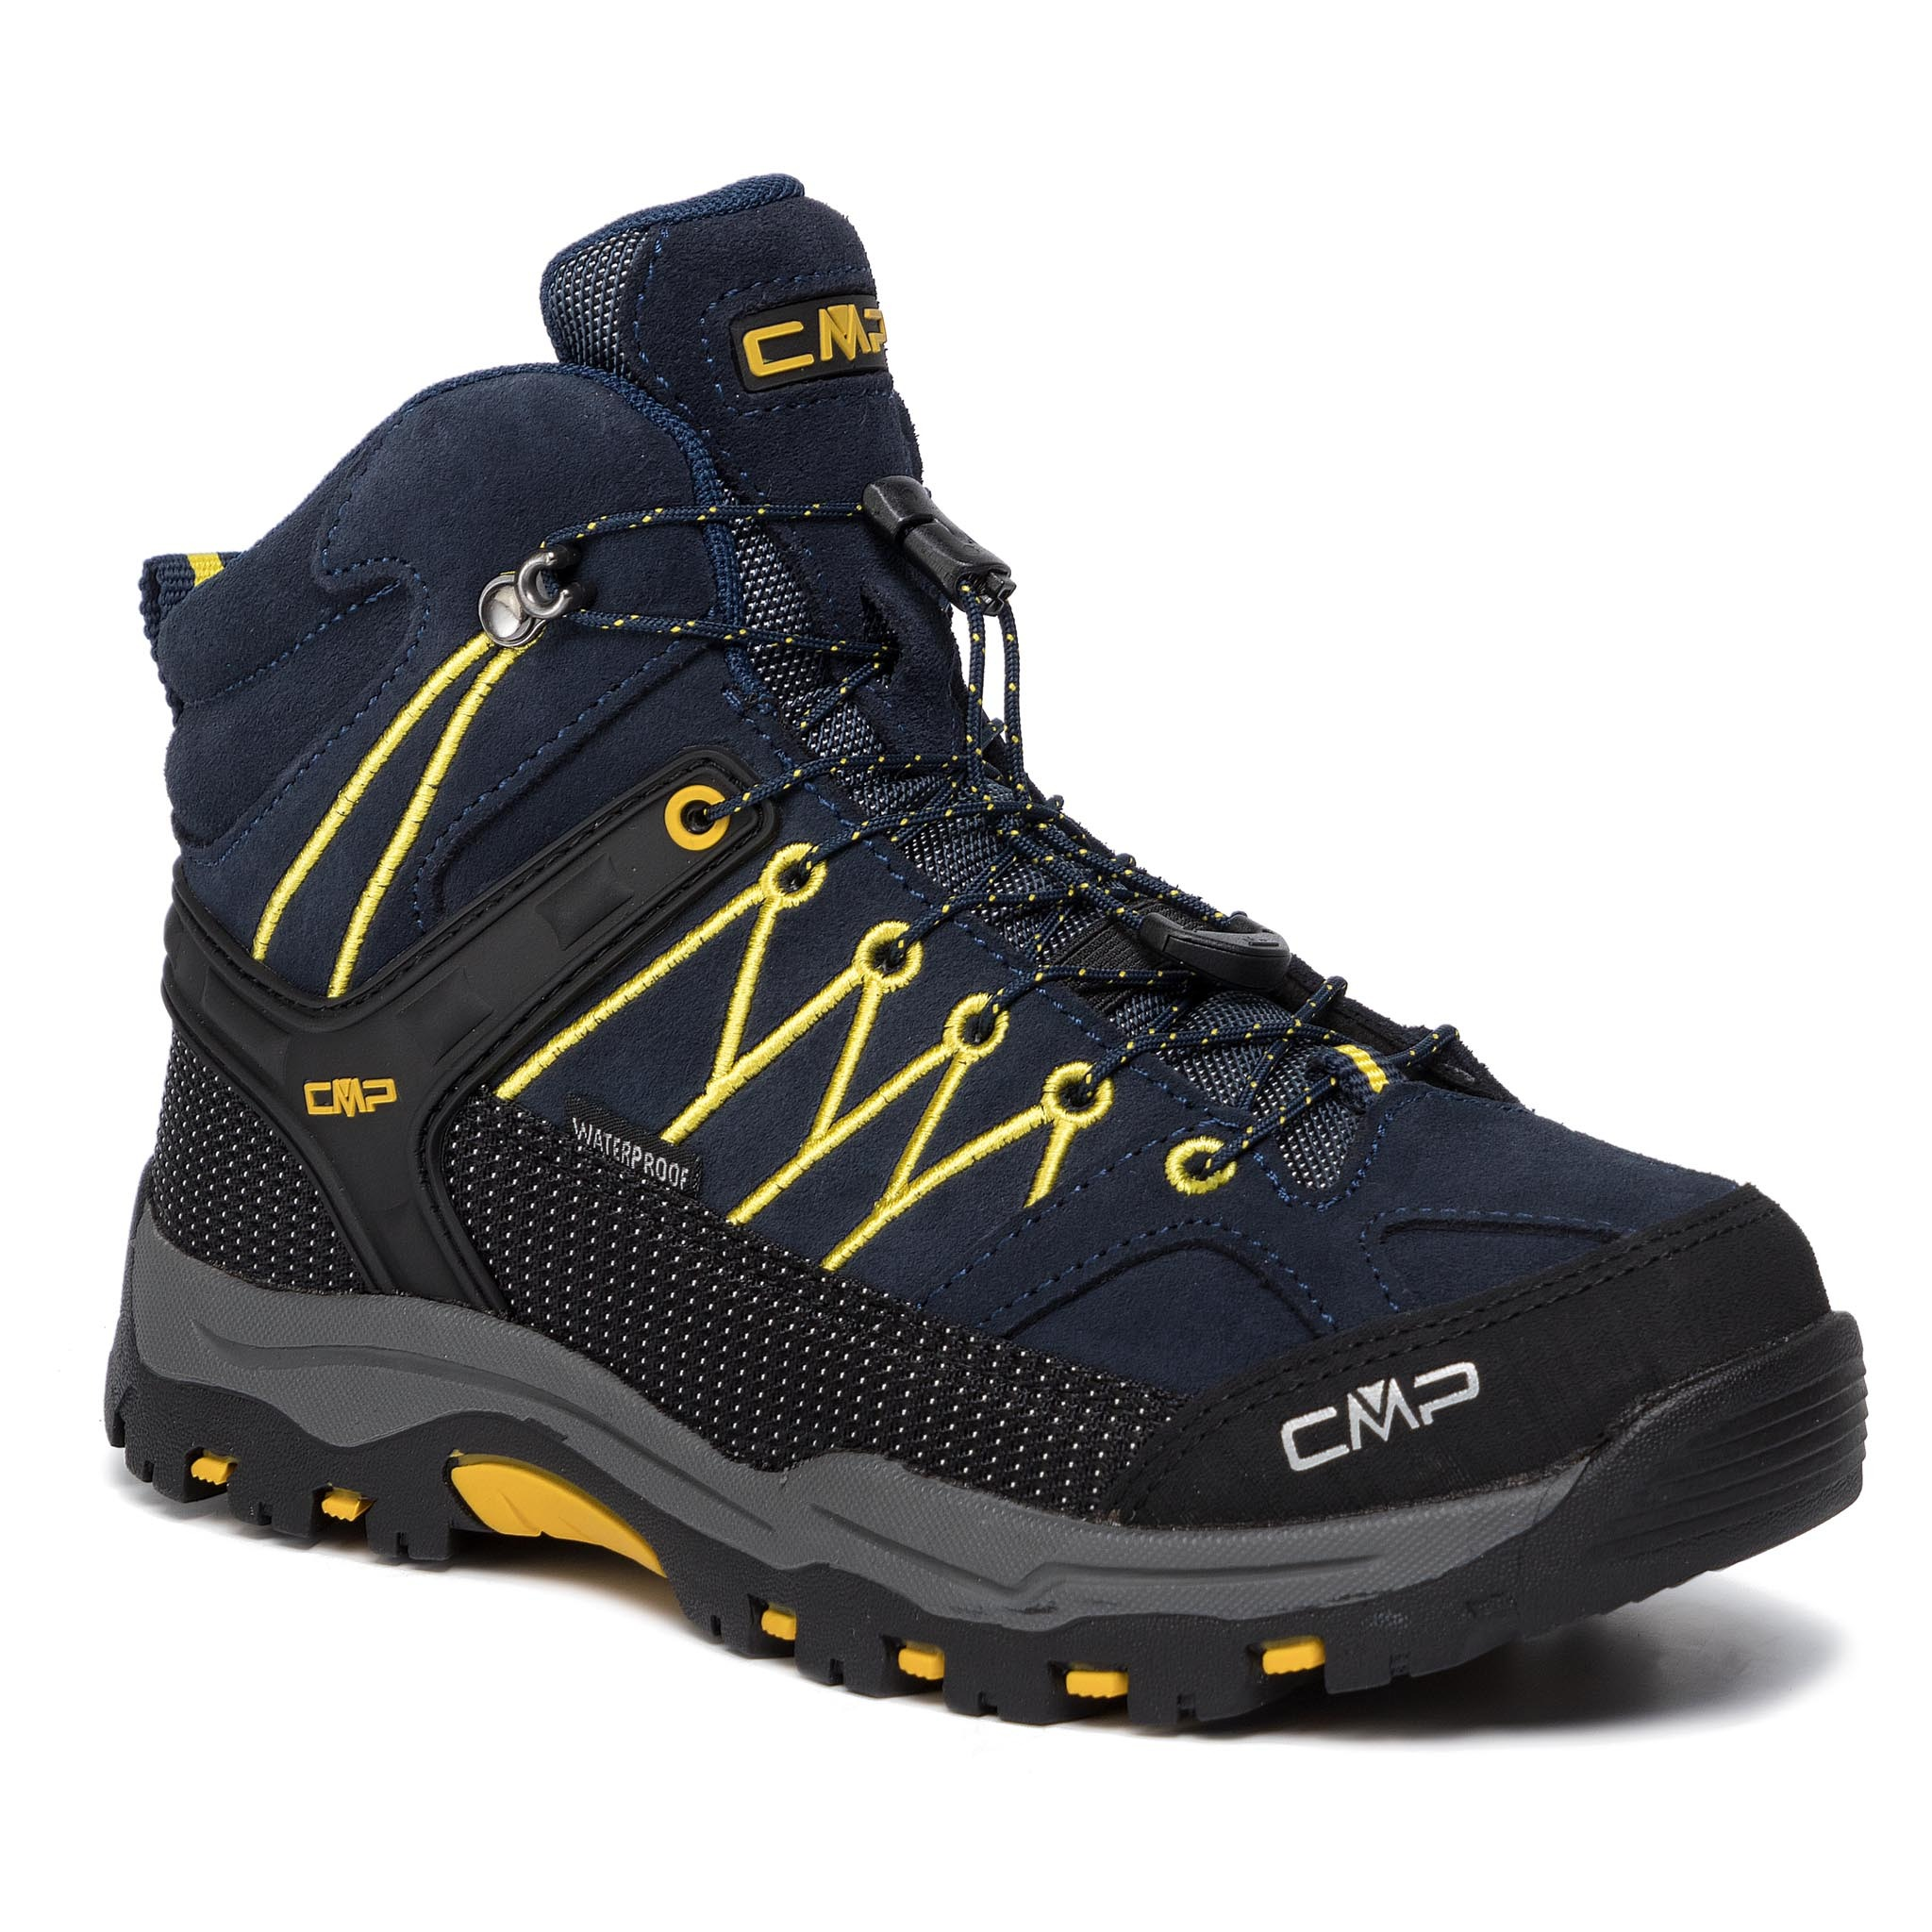 Trekkings CMP - Kids Rigel Mid Trekking Shoes Wp 3Q12944 B.Blue/Zefferano 11ND